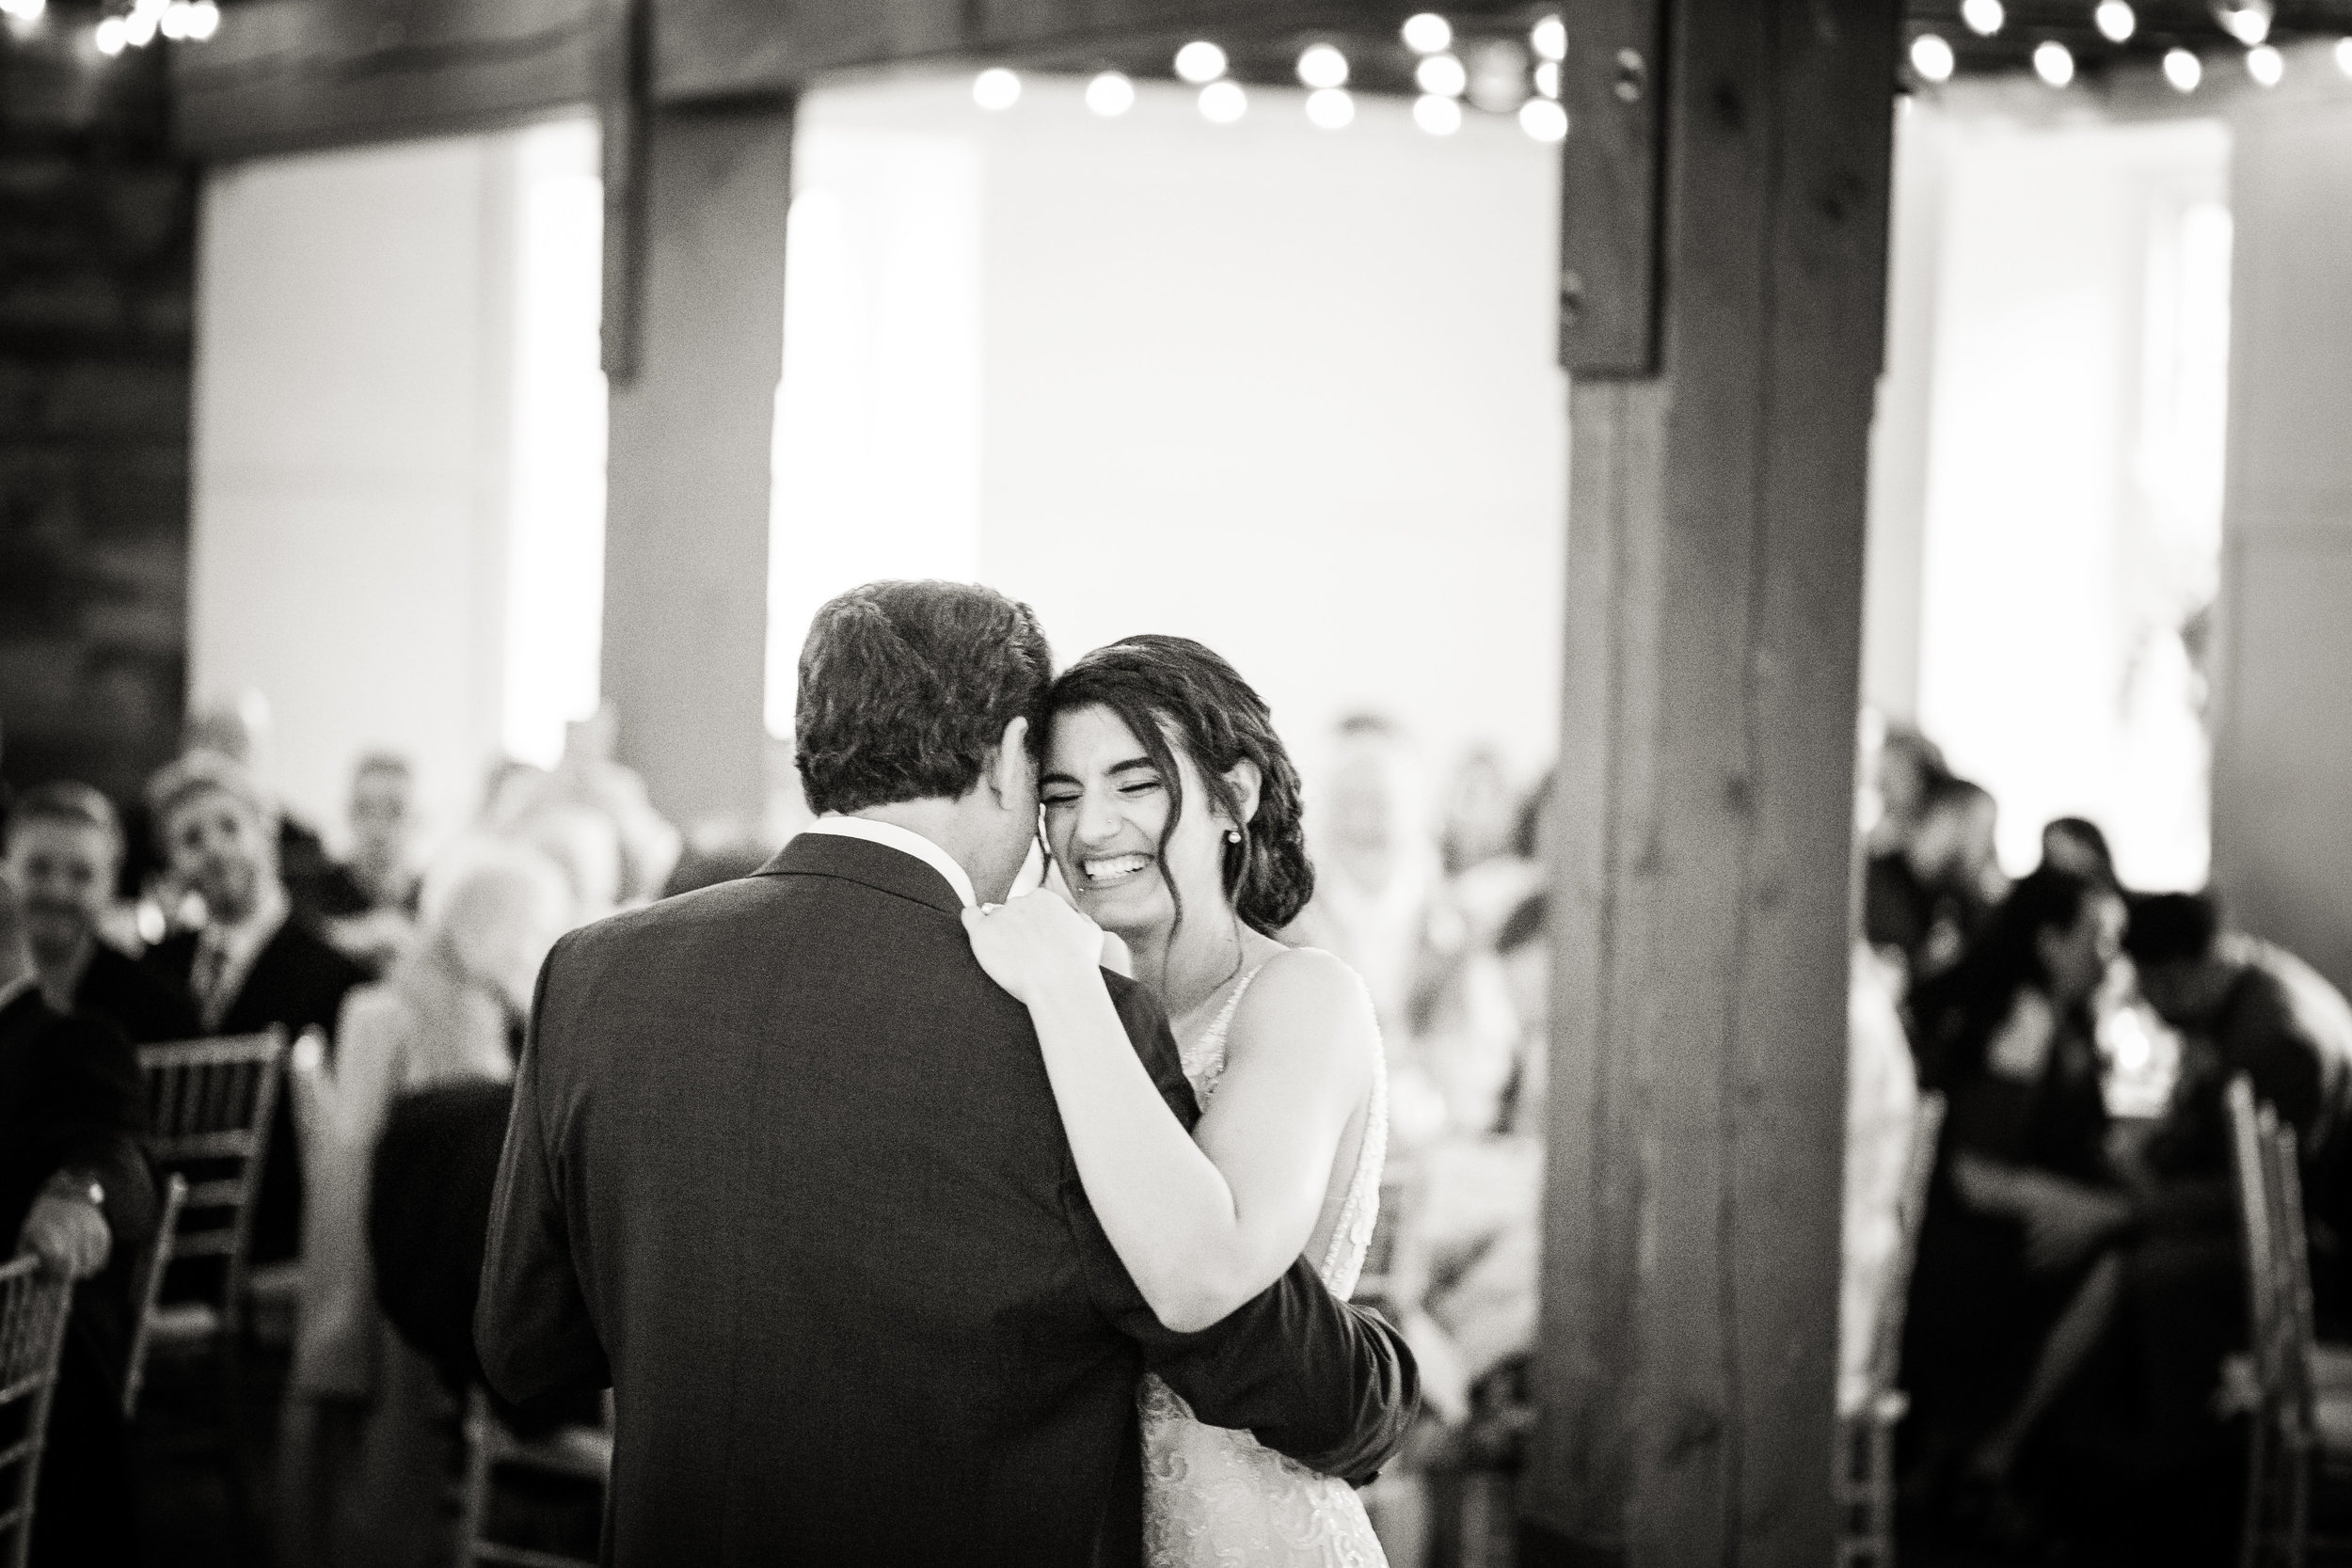 PRALLISVILLE MILLS NEW HOPE WEDDING PHOTOGRAPHY-105.jpg